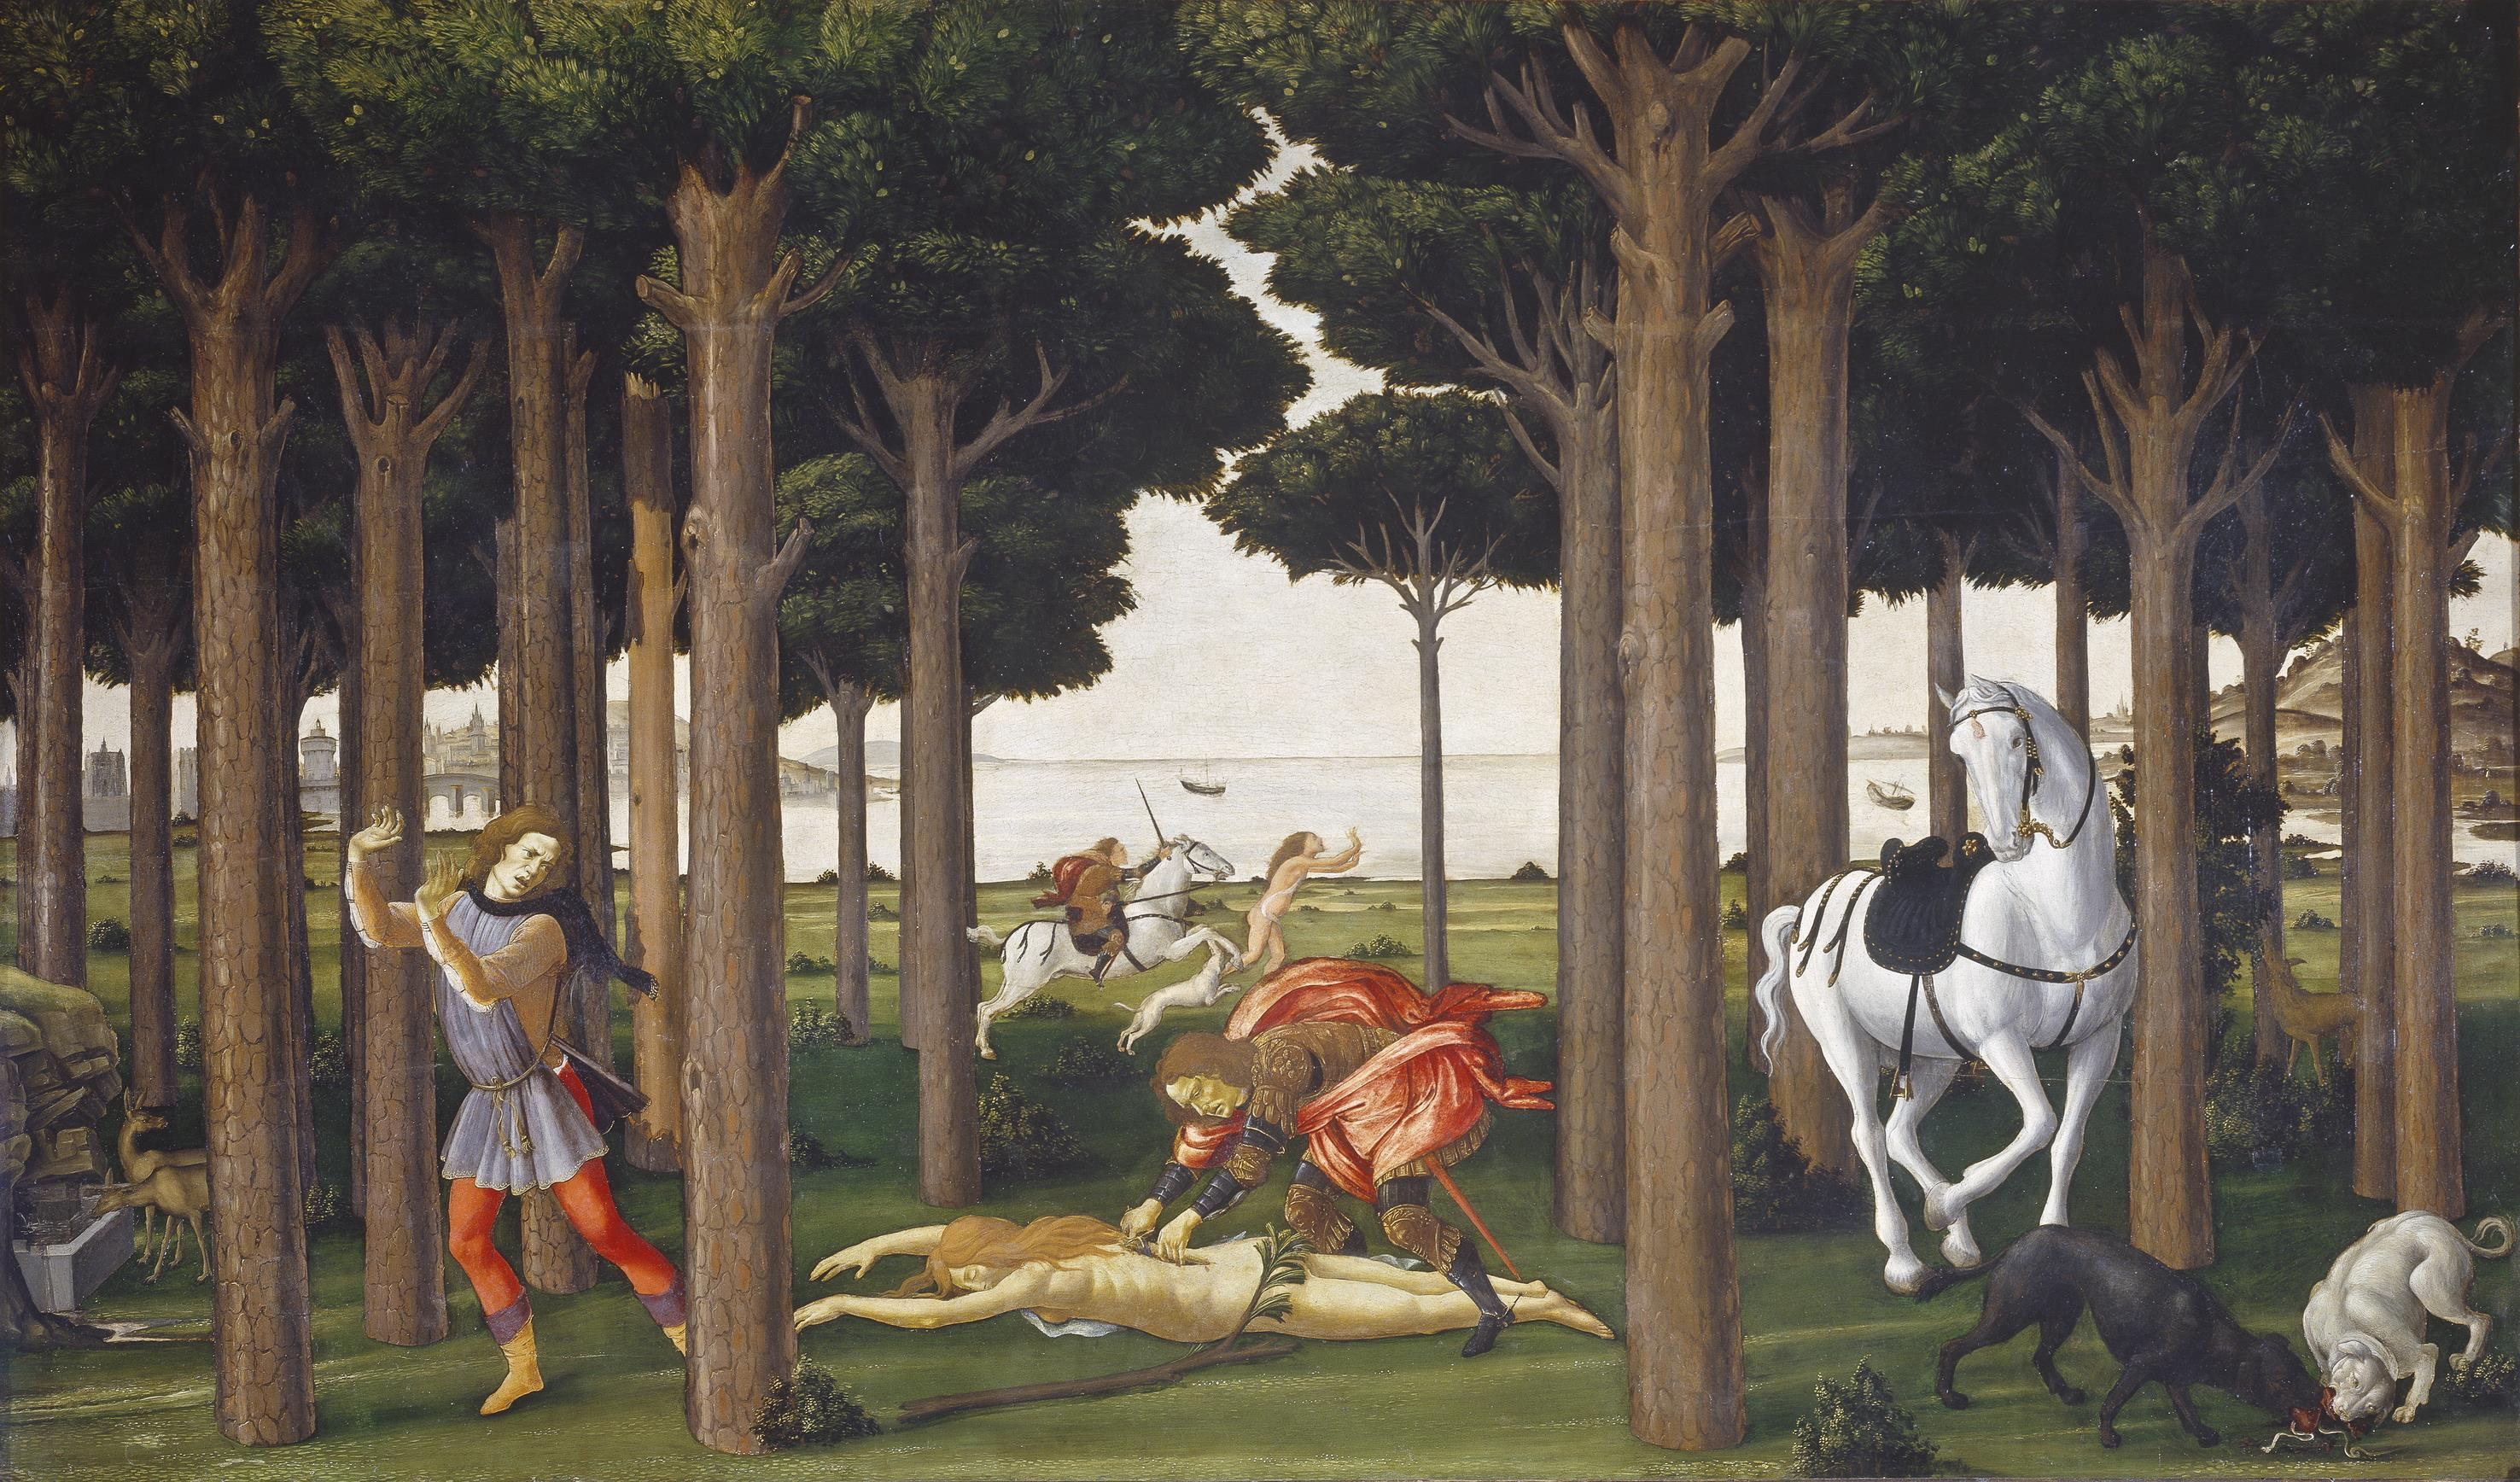 https://upload.wikimedia.org/wikipedia/commons/1/1d/Botticelli_Prado_104.jpg